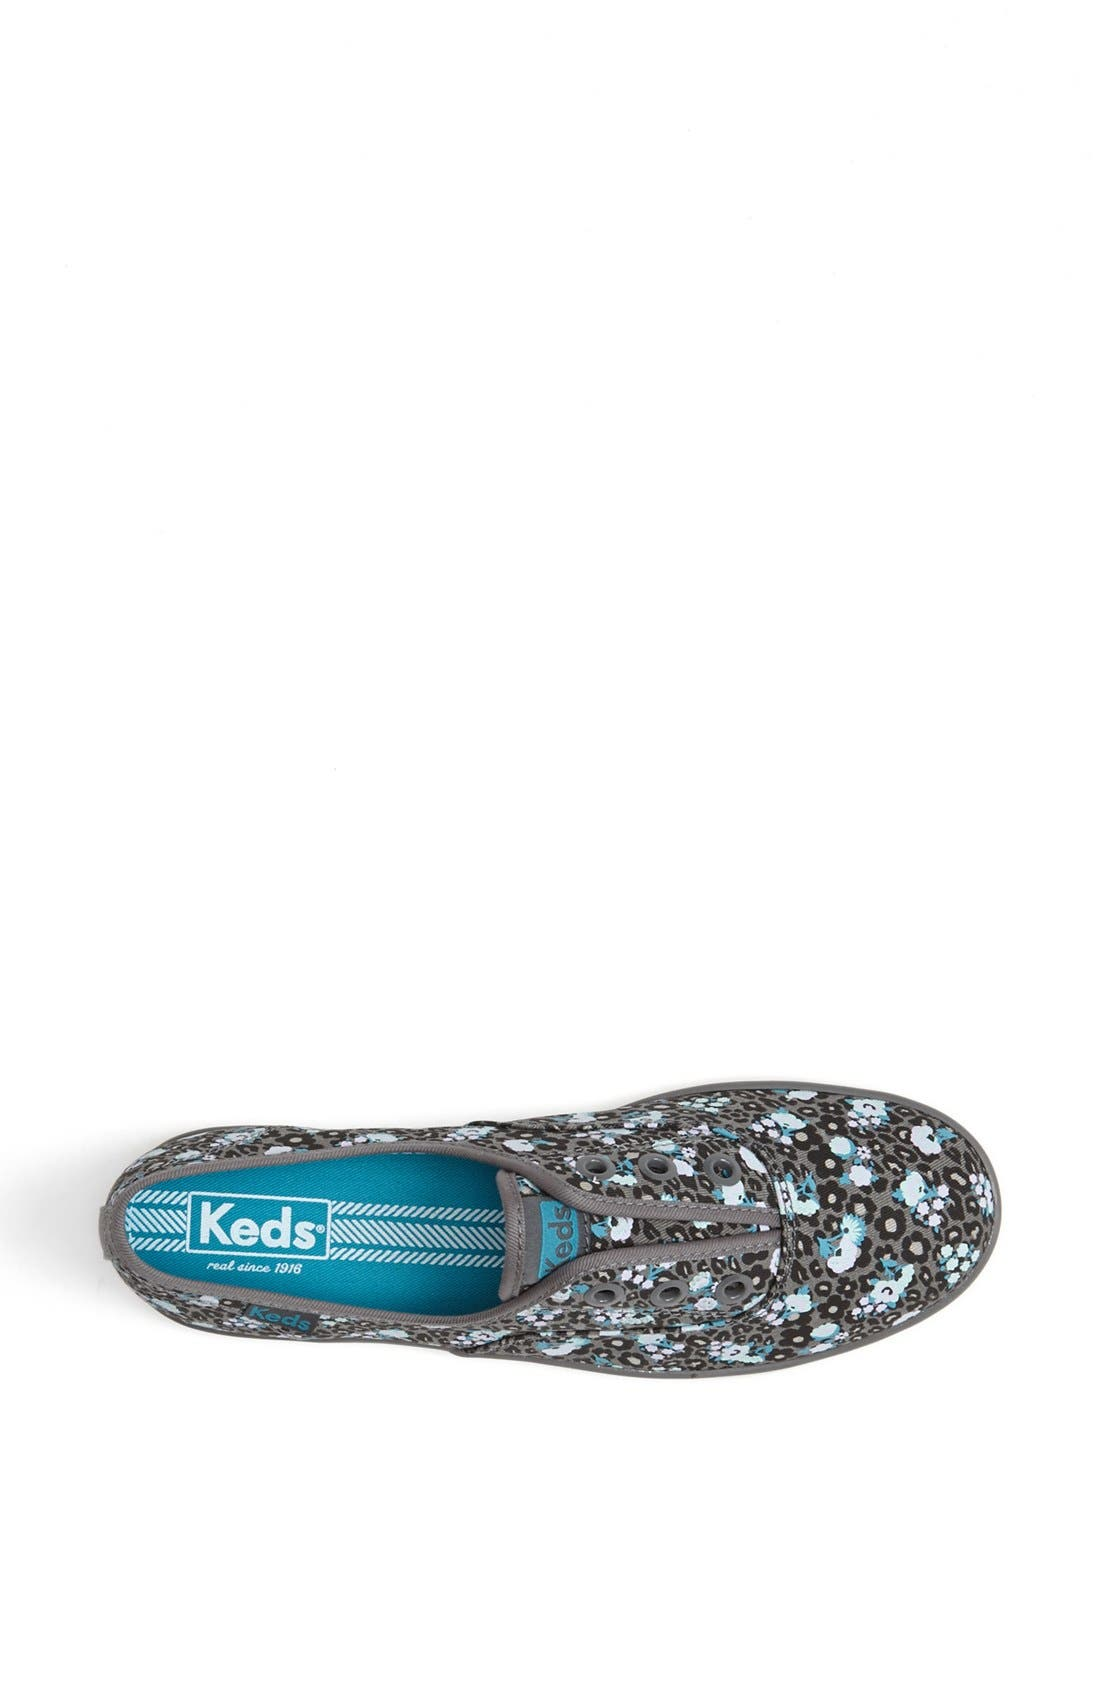 Alternate Image 3  - Keds® 'Rookie - Leopard Floral' Laceless Sneaker (Women)